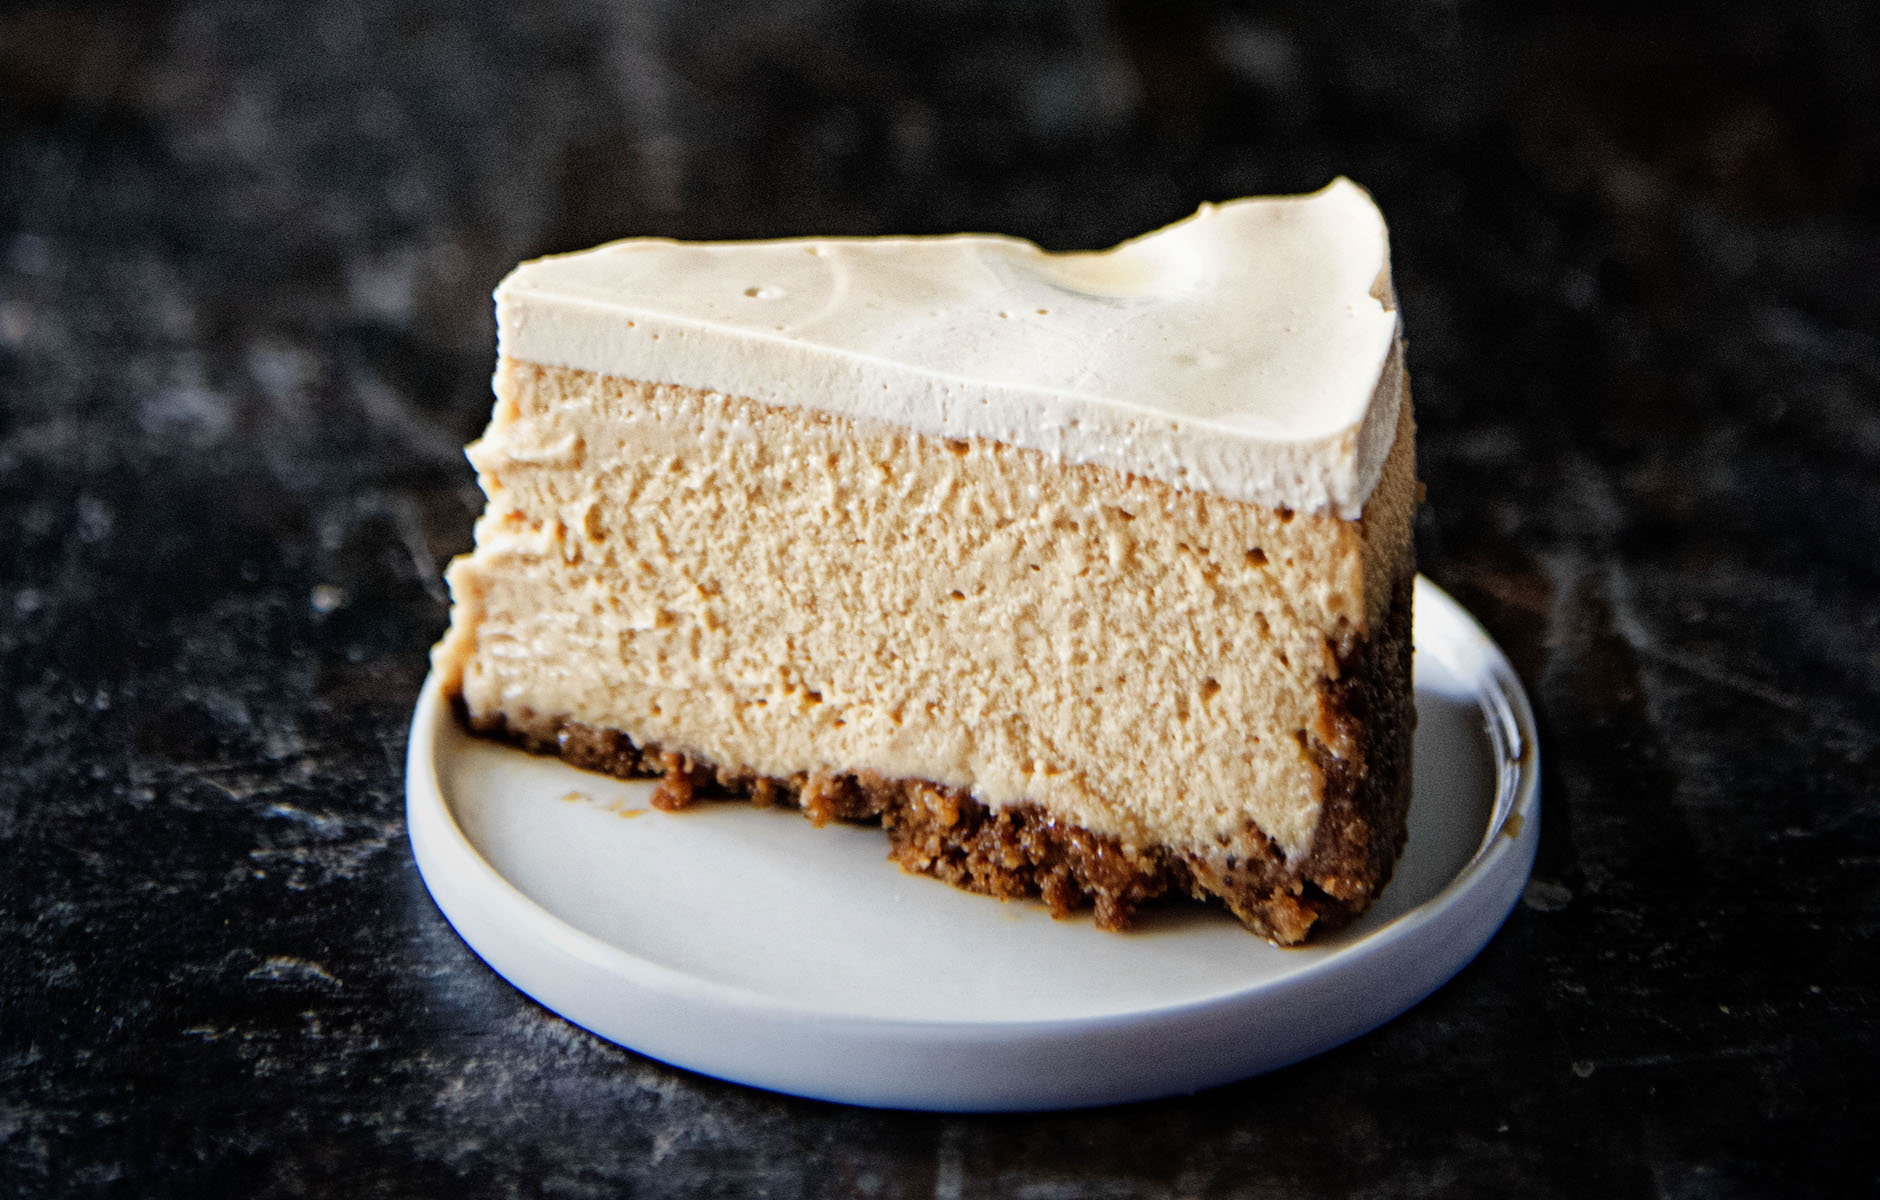 Fireball Sour Cream Topped Brown Sugar Cheesecake